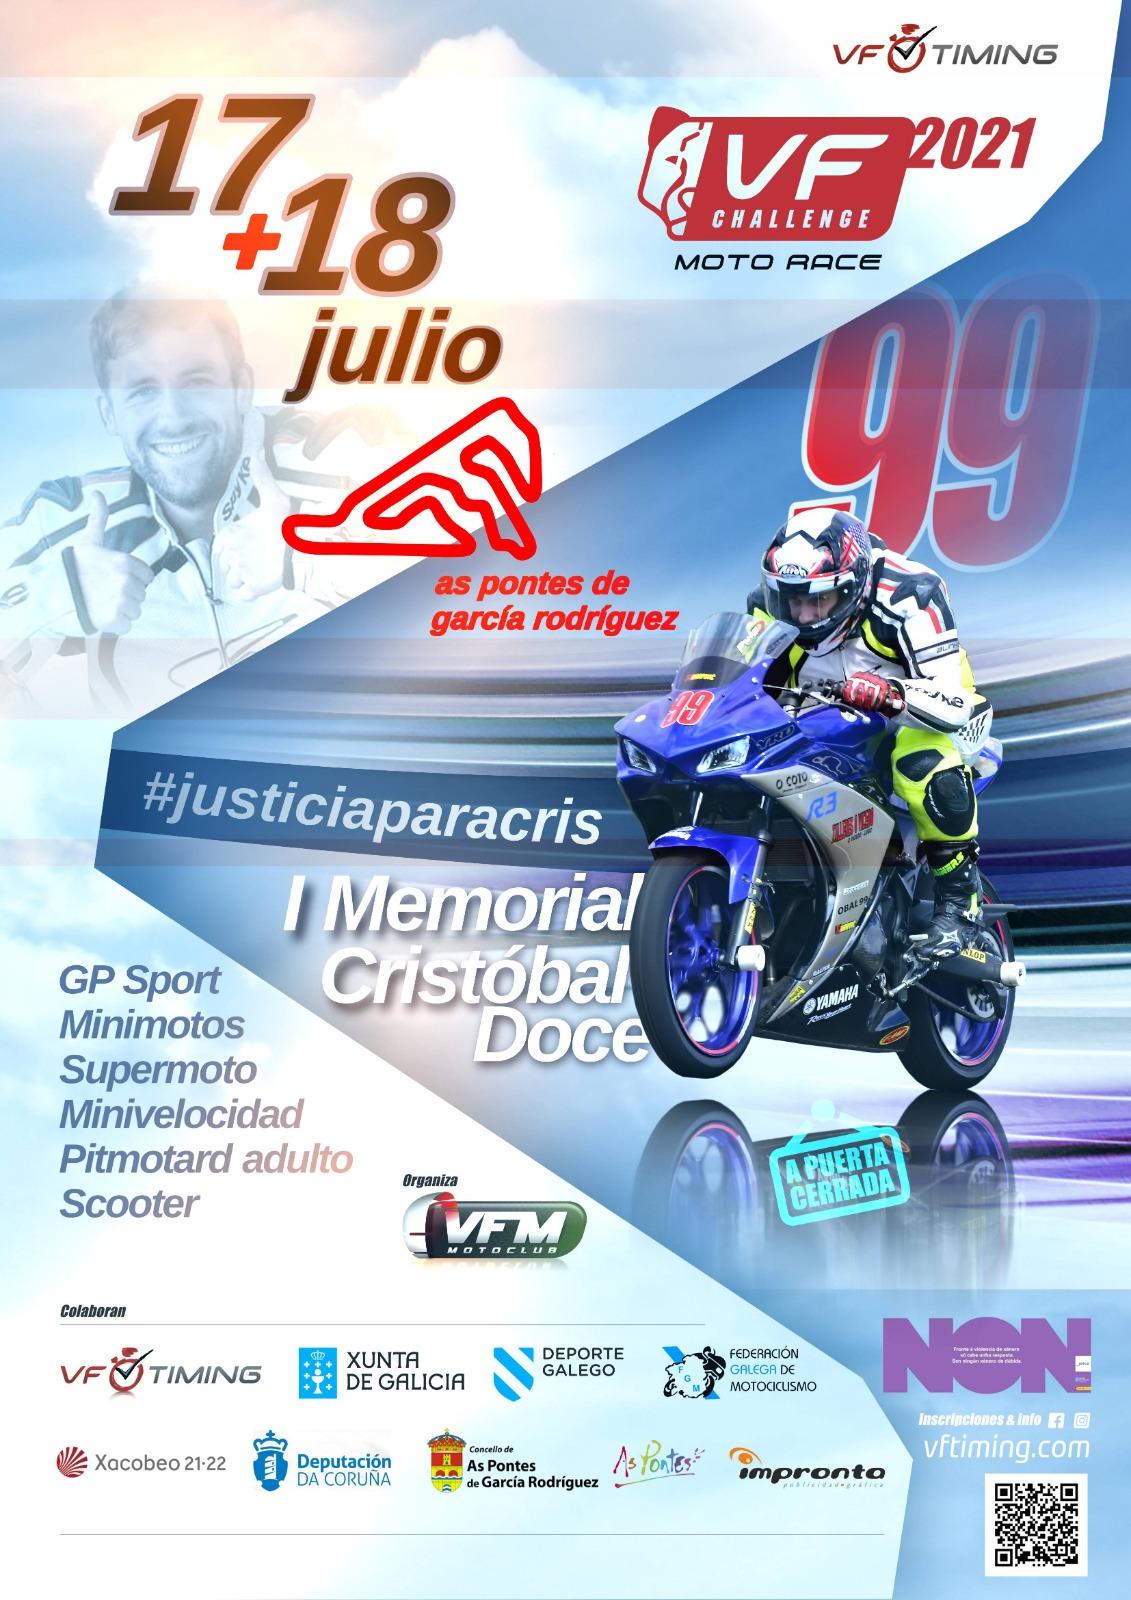 VF Challenge MR As Pontes I Memorial Cristobal Doce